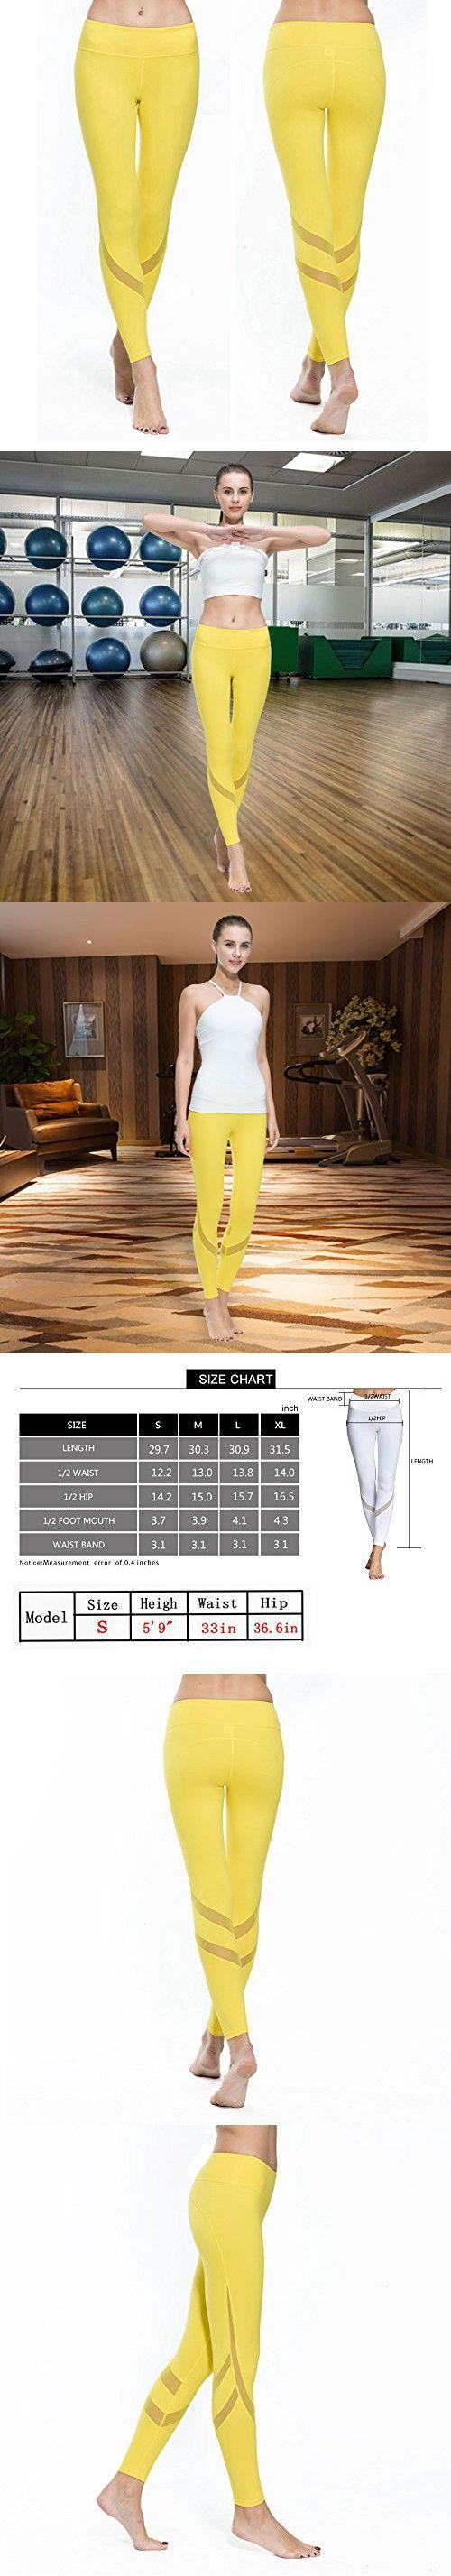 Women Yoga Pants Leggings with Mesh Compression Workout Gym Capri Yoga Pants Yellow Hidden Pocket Ninth NK9-002 (M, Yellow)